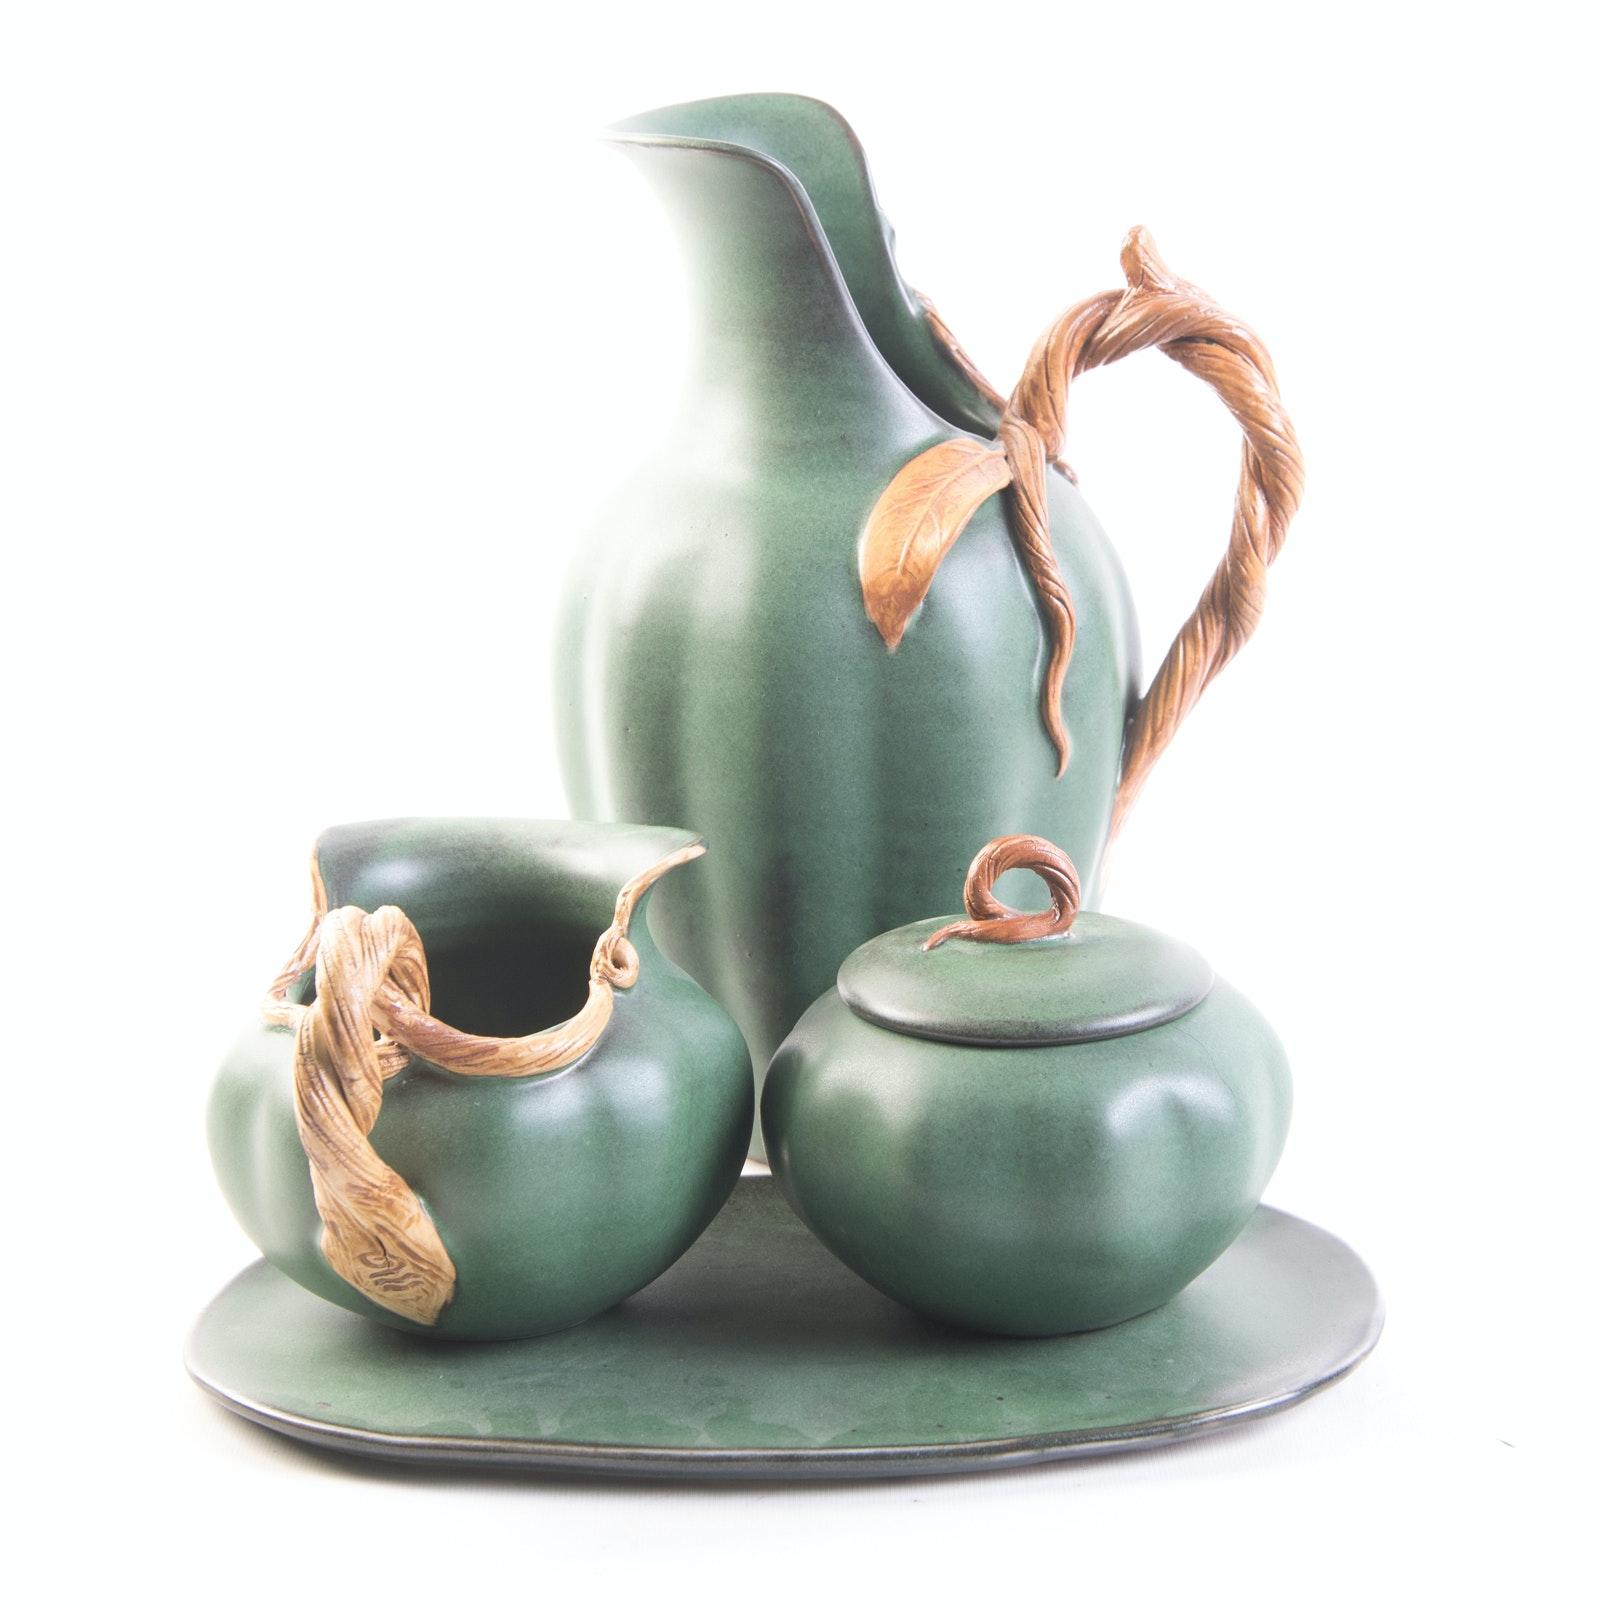 Figurative Thrown and Altered Porcelain Beverage Set